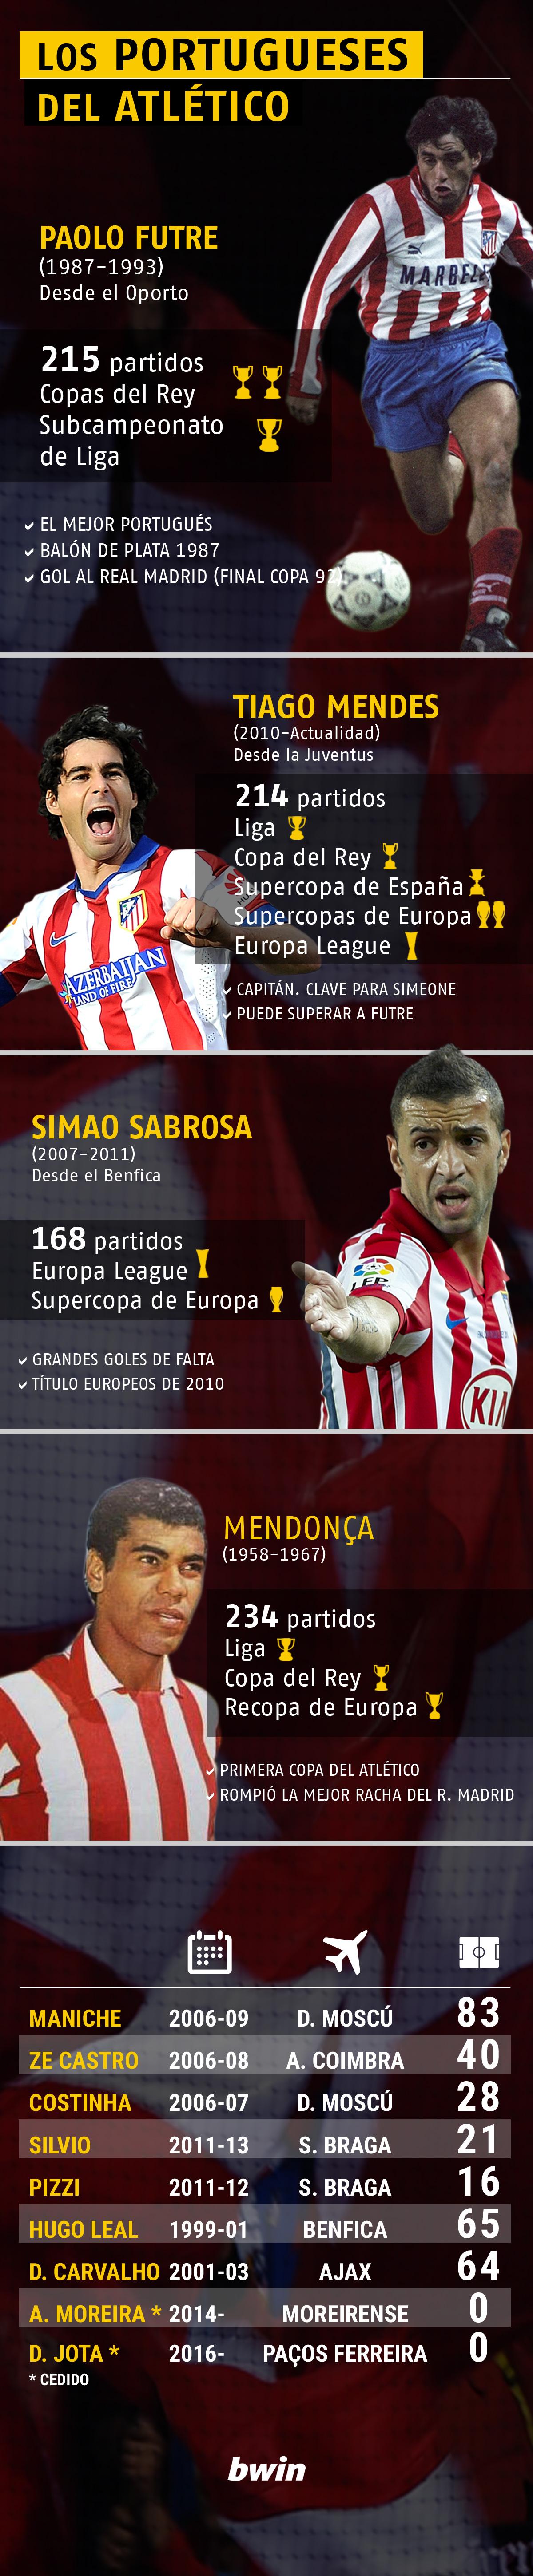 portugueses-atleticos